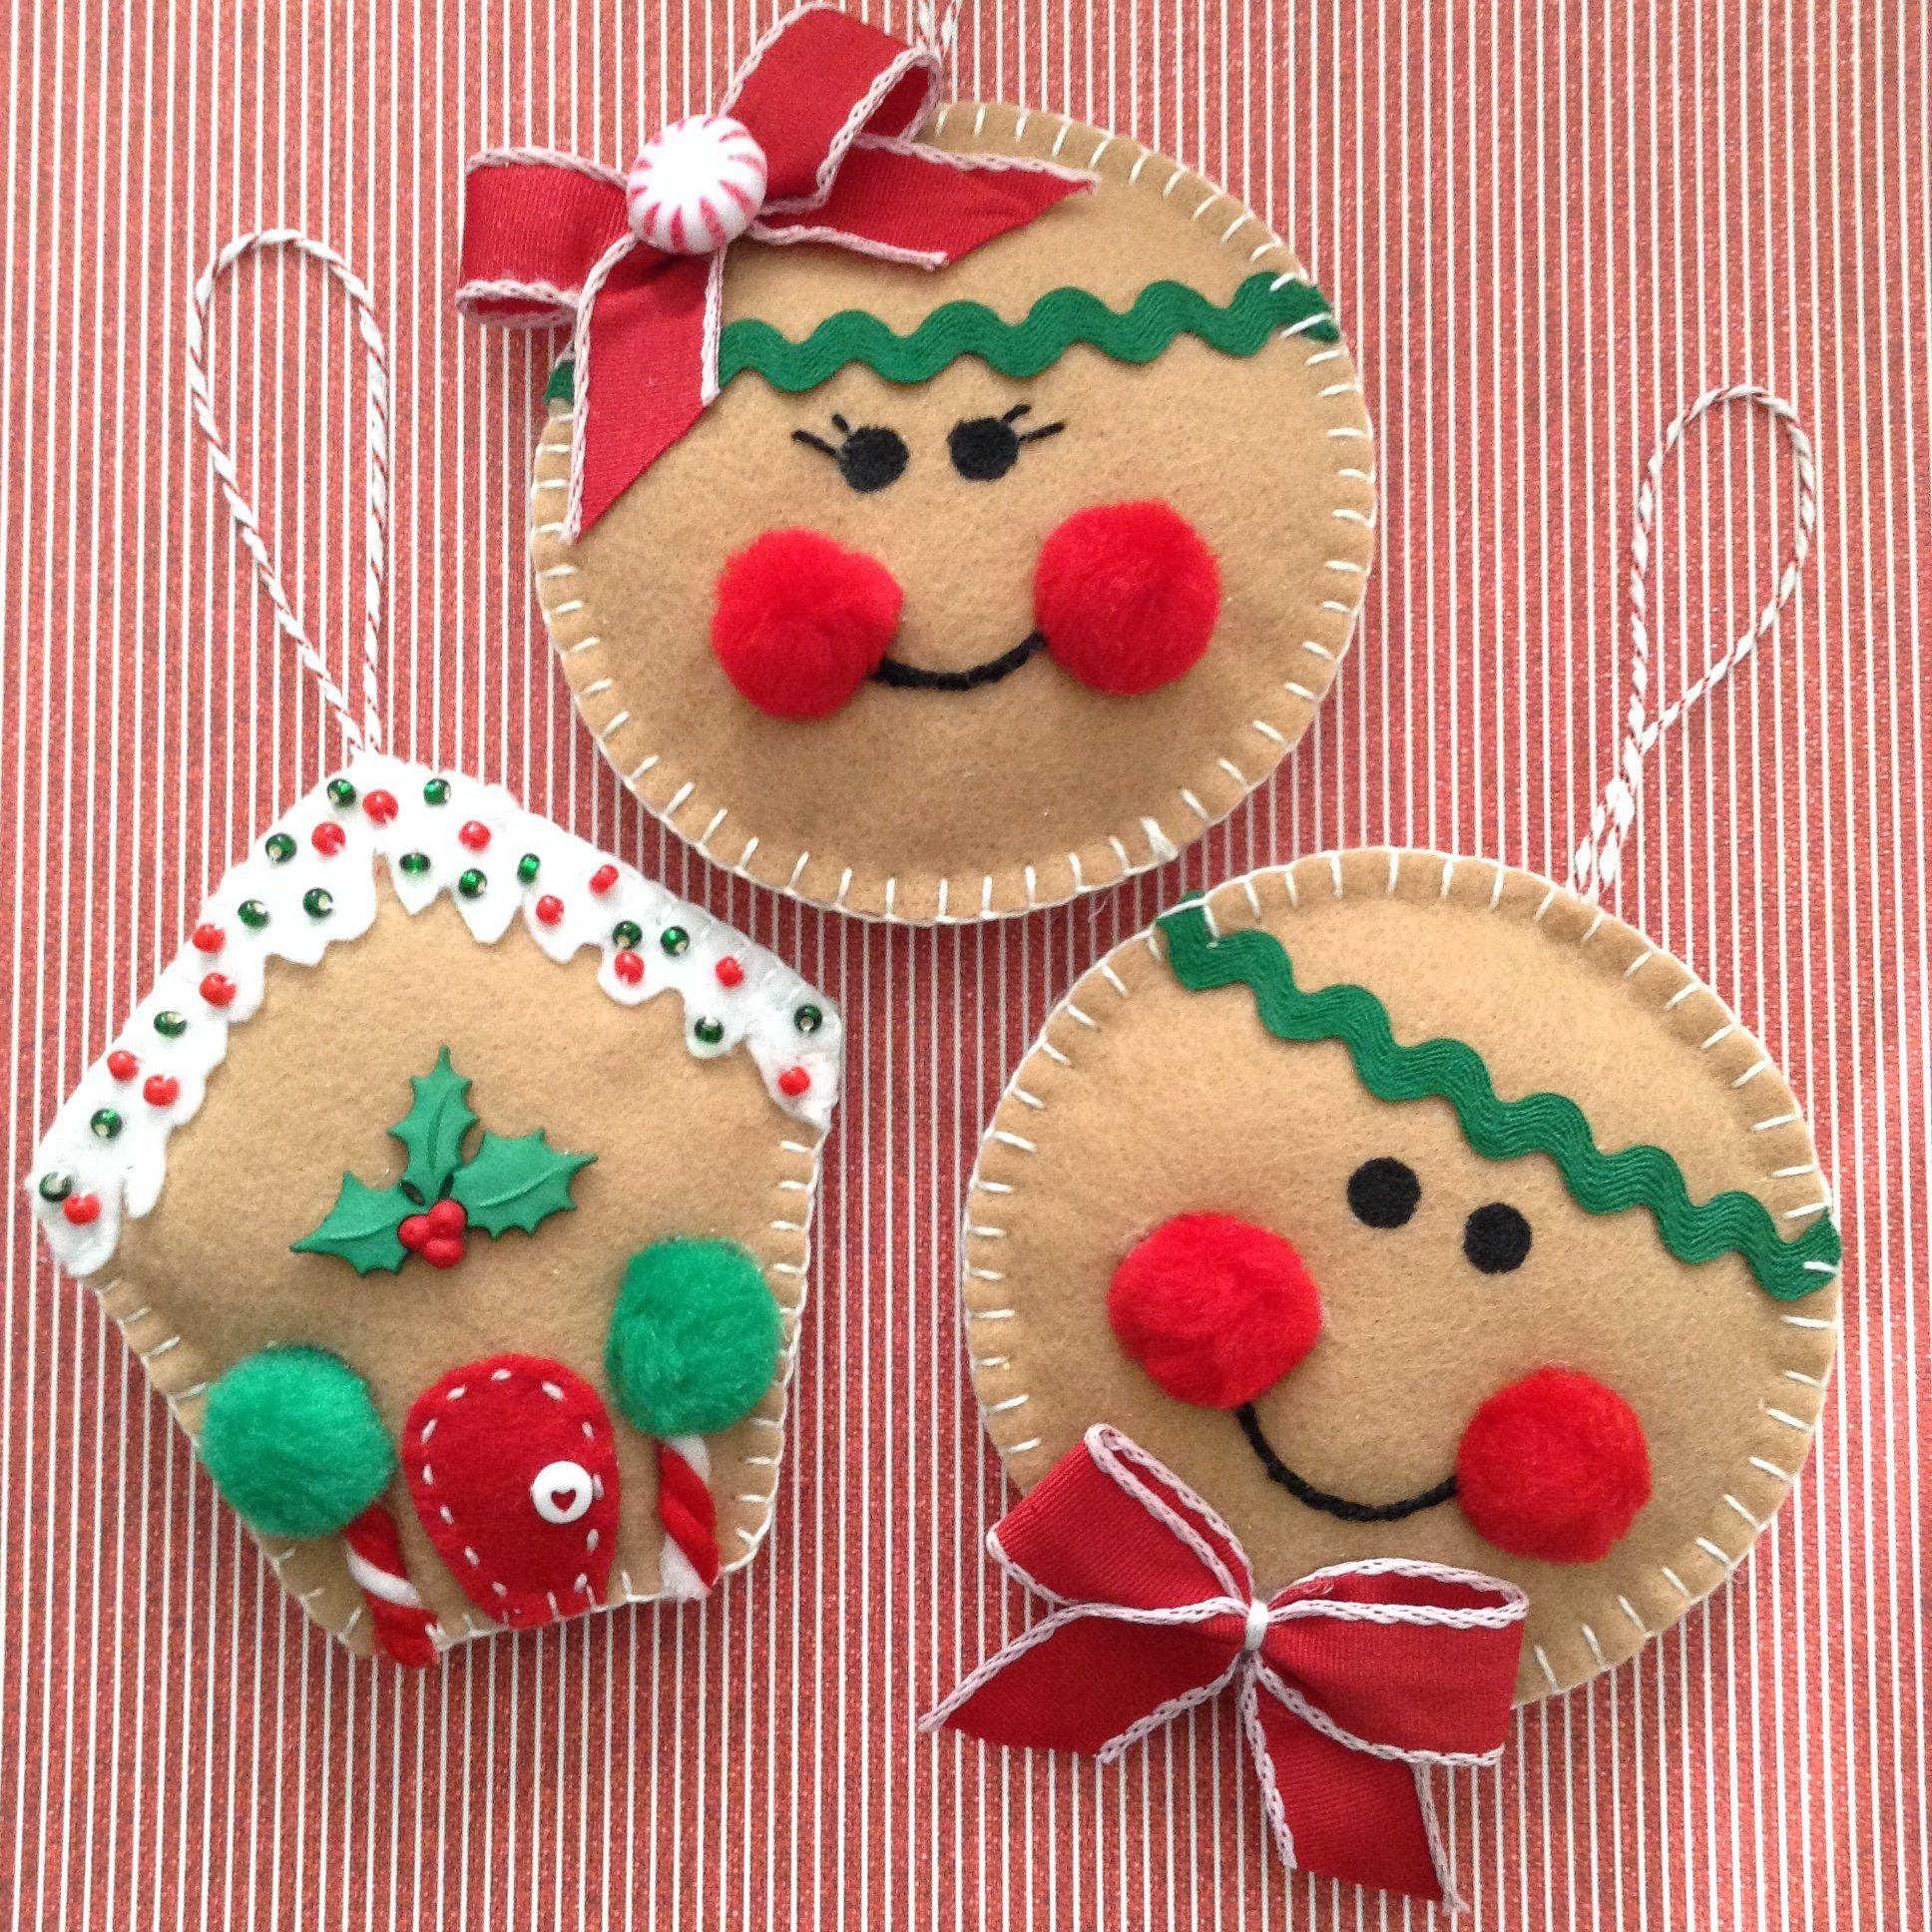 Felt Gingerbread Man Christmas Felt Ornament Decor By Mymagicfelt